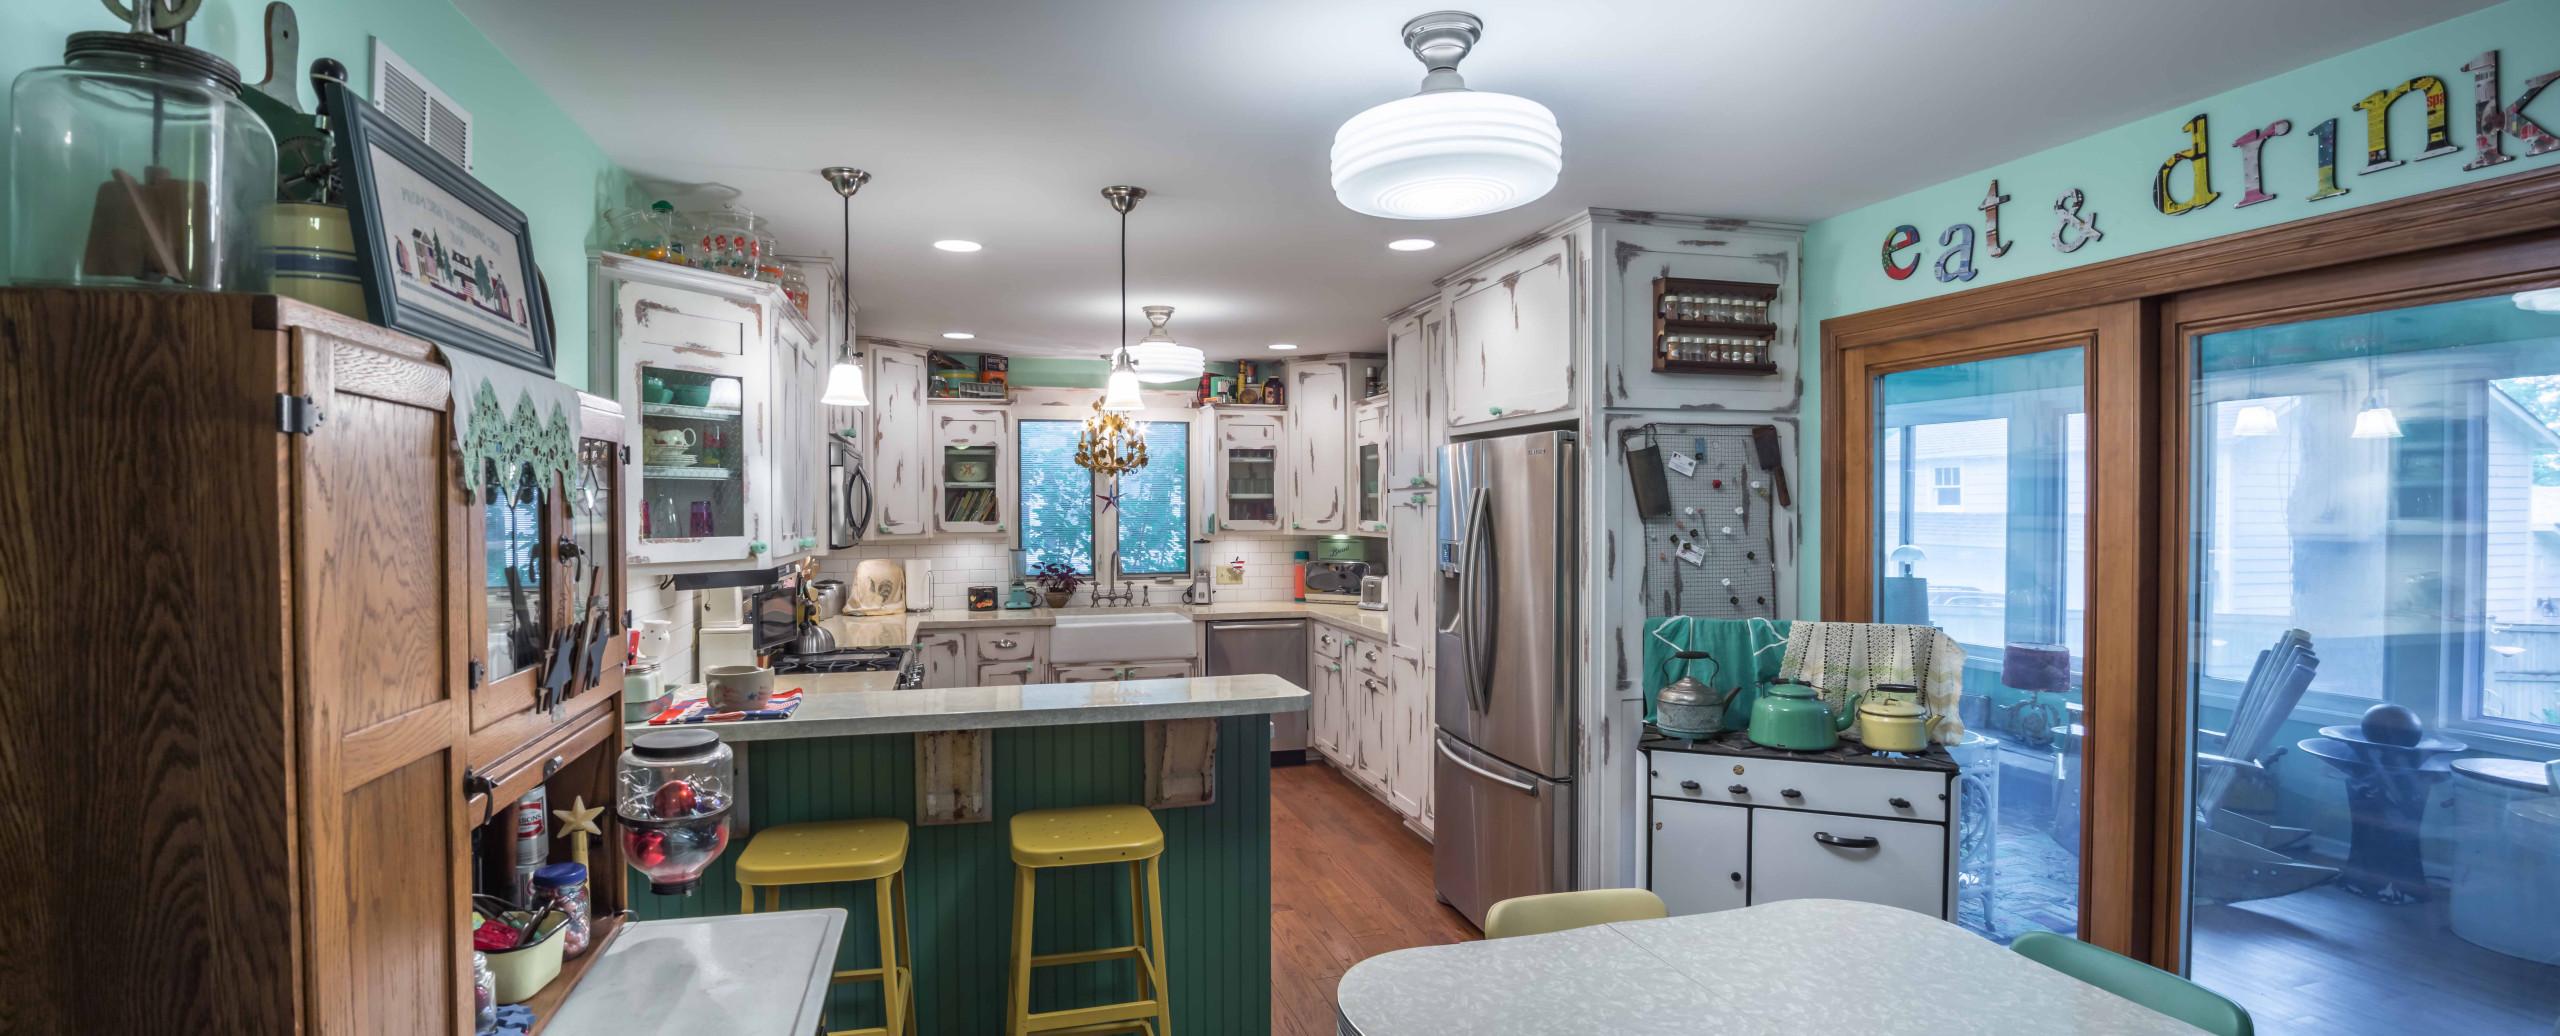 Shabby-Chic Country Kitchen & Sunroom